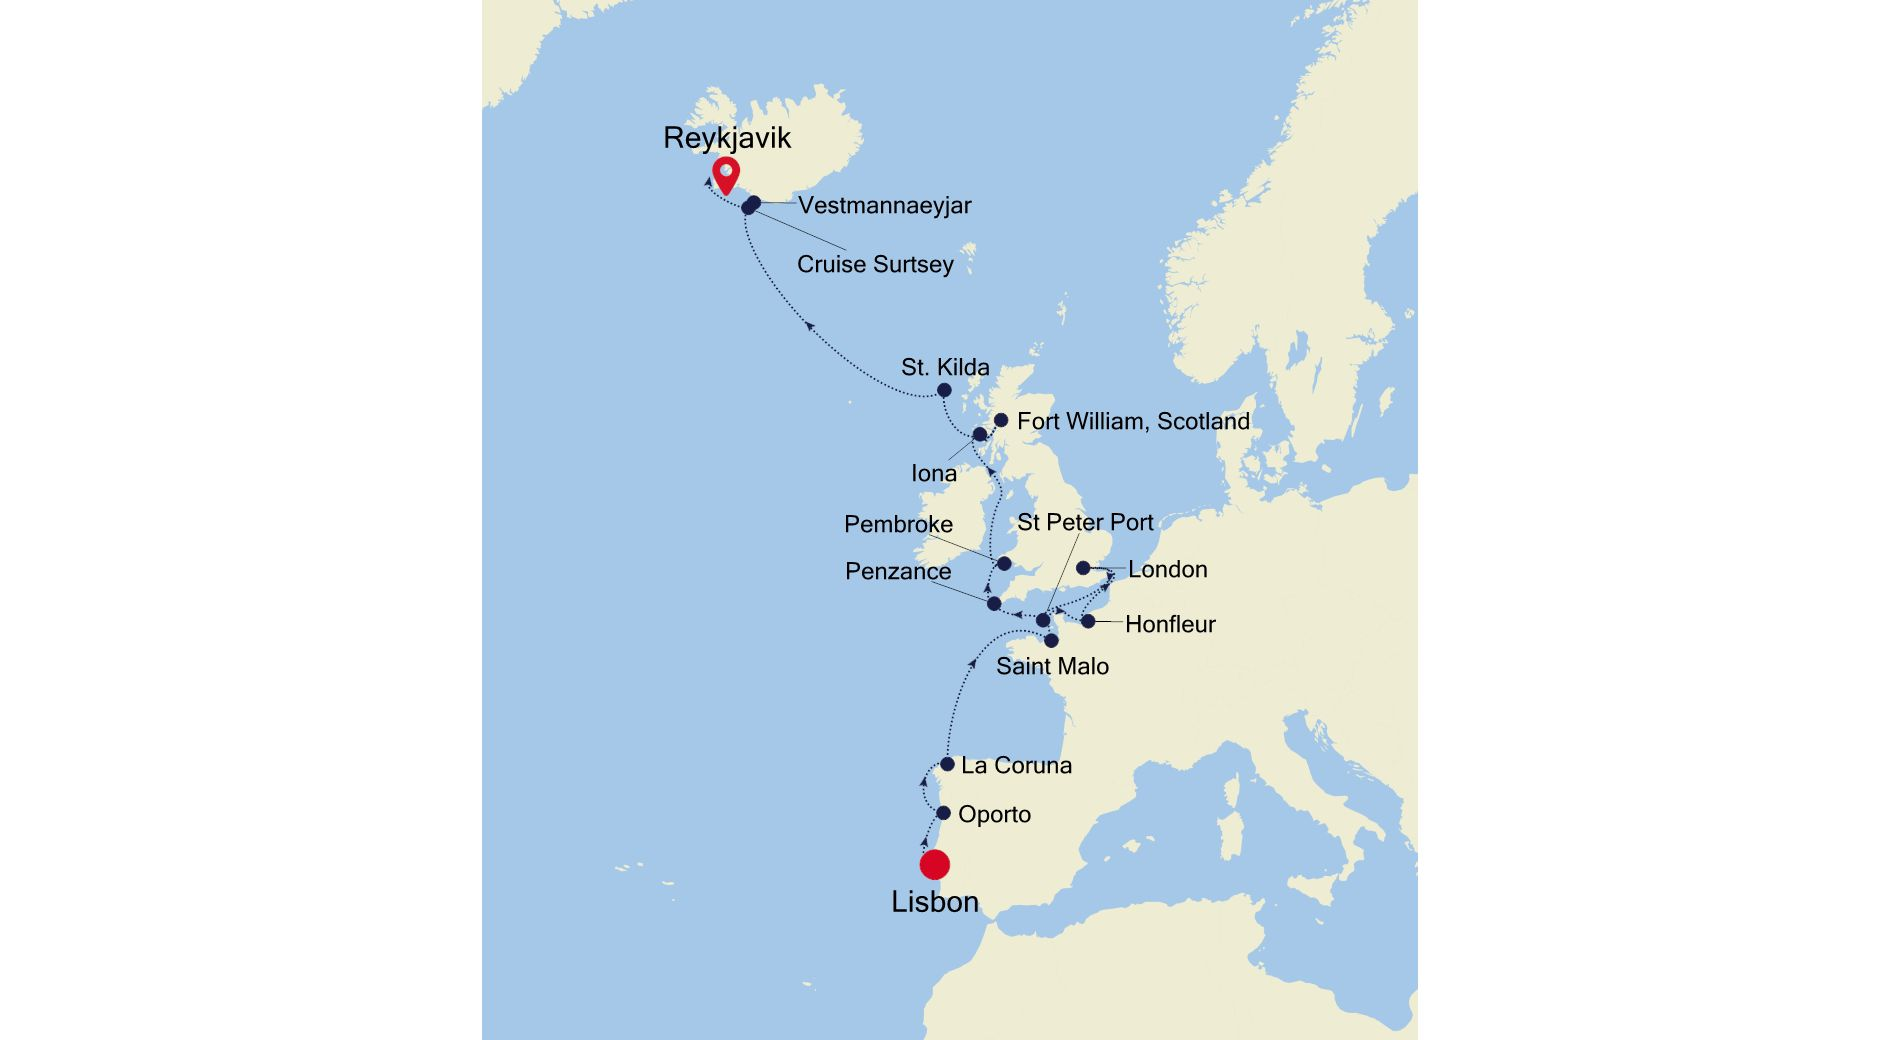 E4220611017 - Lisbon nach Reykjavik